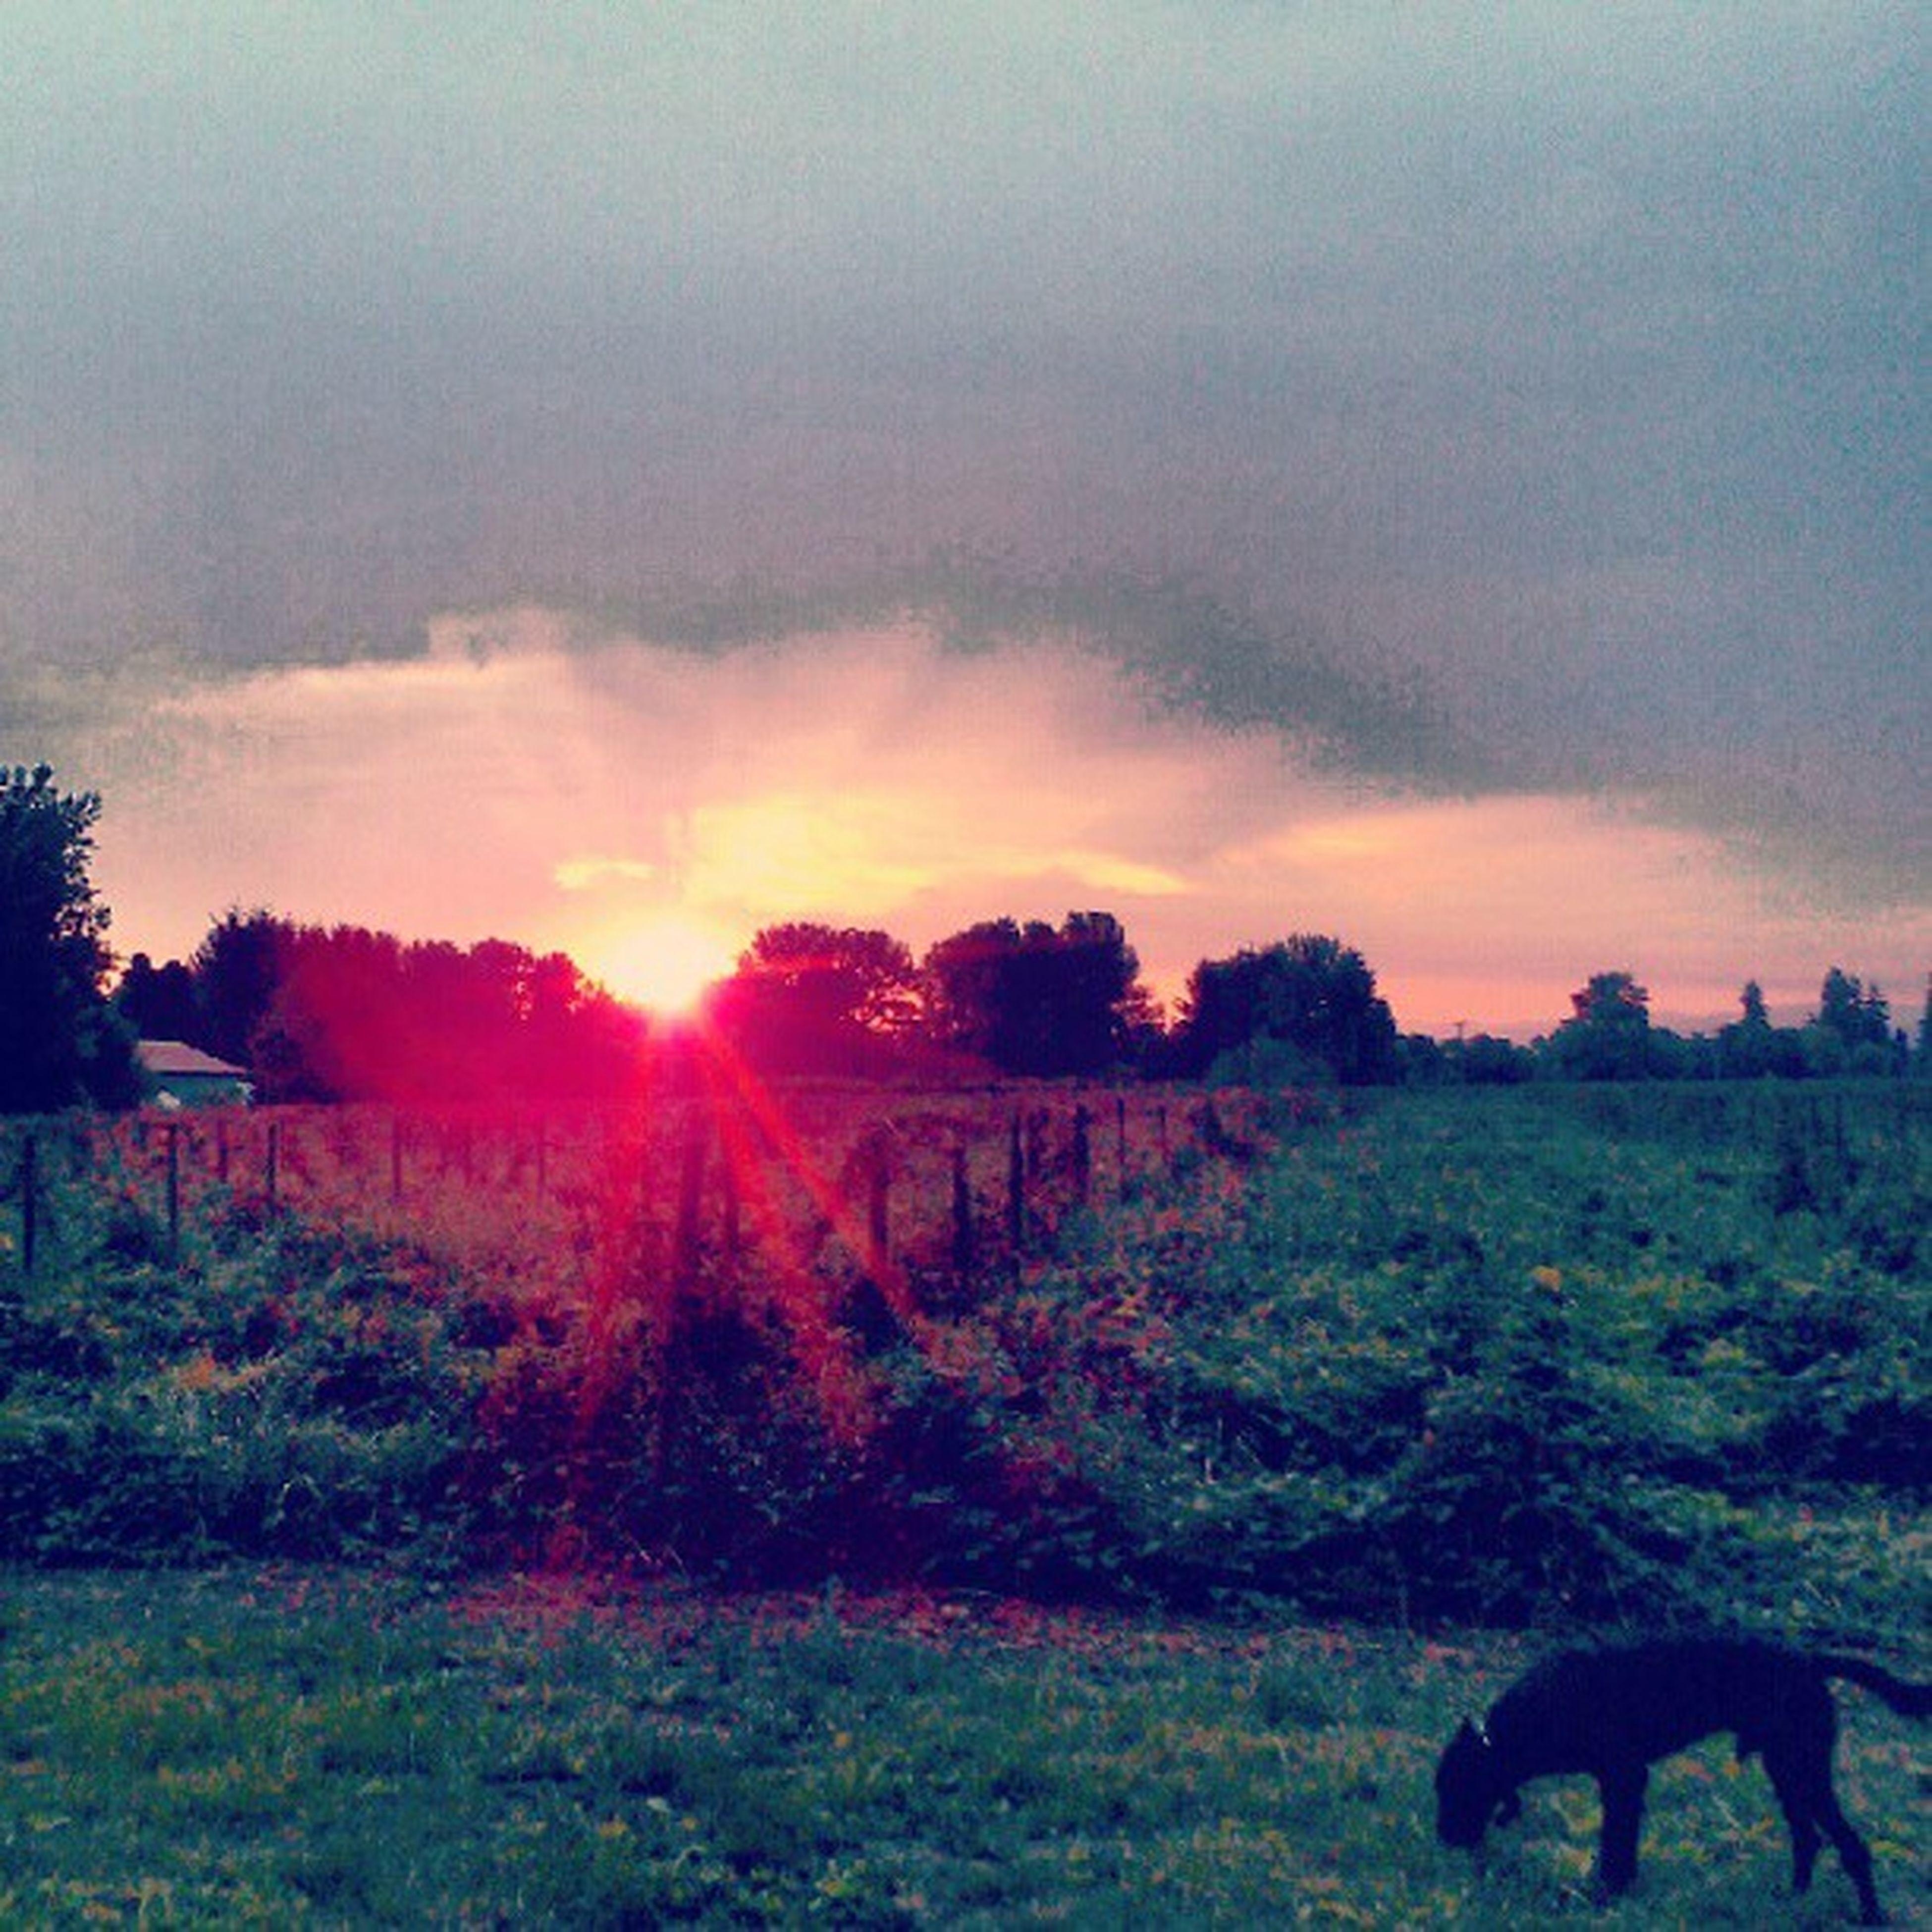 sky, field, sunset, landscape, grass, tranquil scene, animal themes, tranquility, domestic animals, tree, beauty in nature, scenics, nature, cloud - sky, grassy, sun, mammal, one animal, growth, idyllic